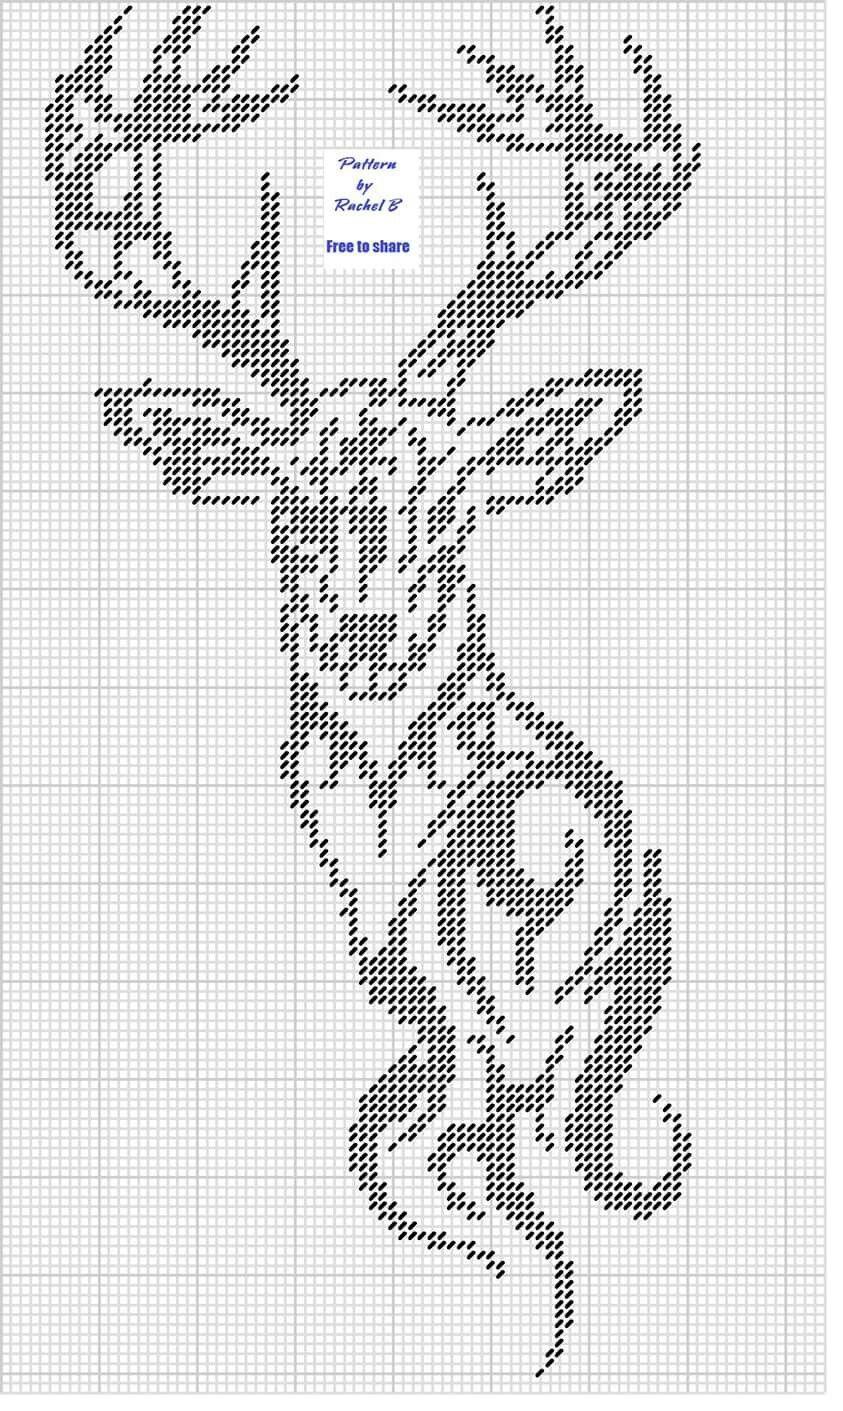 Harry Potter Crochet Cushion